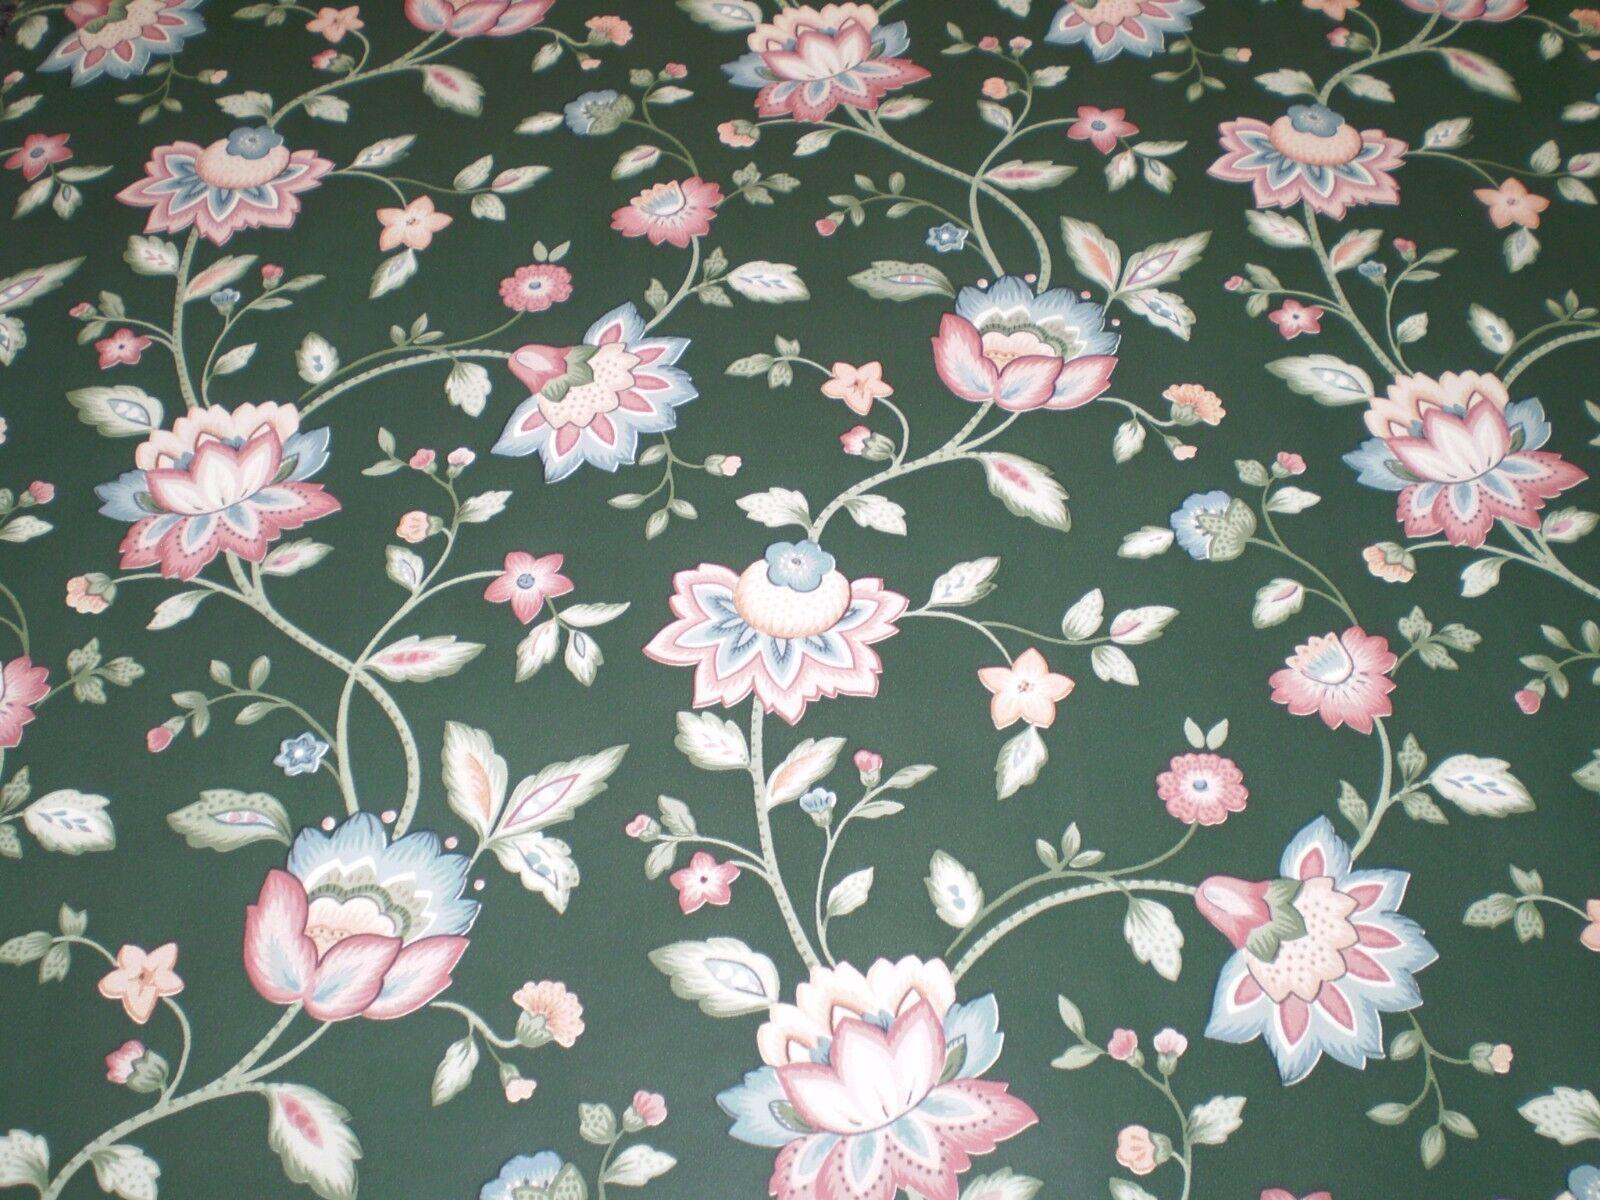 Fine Decor Dollhouse Collection Wallpaper Classic Green Floral